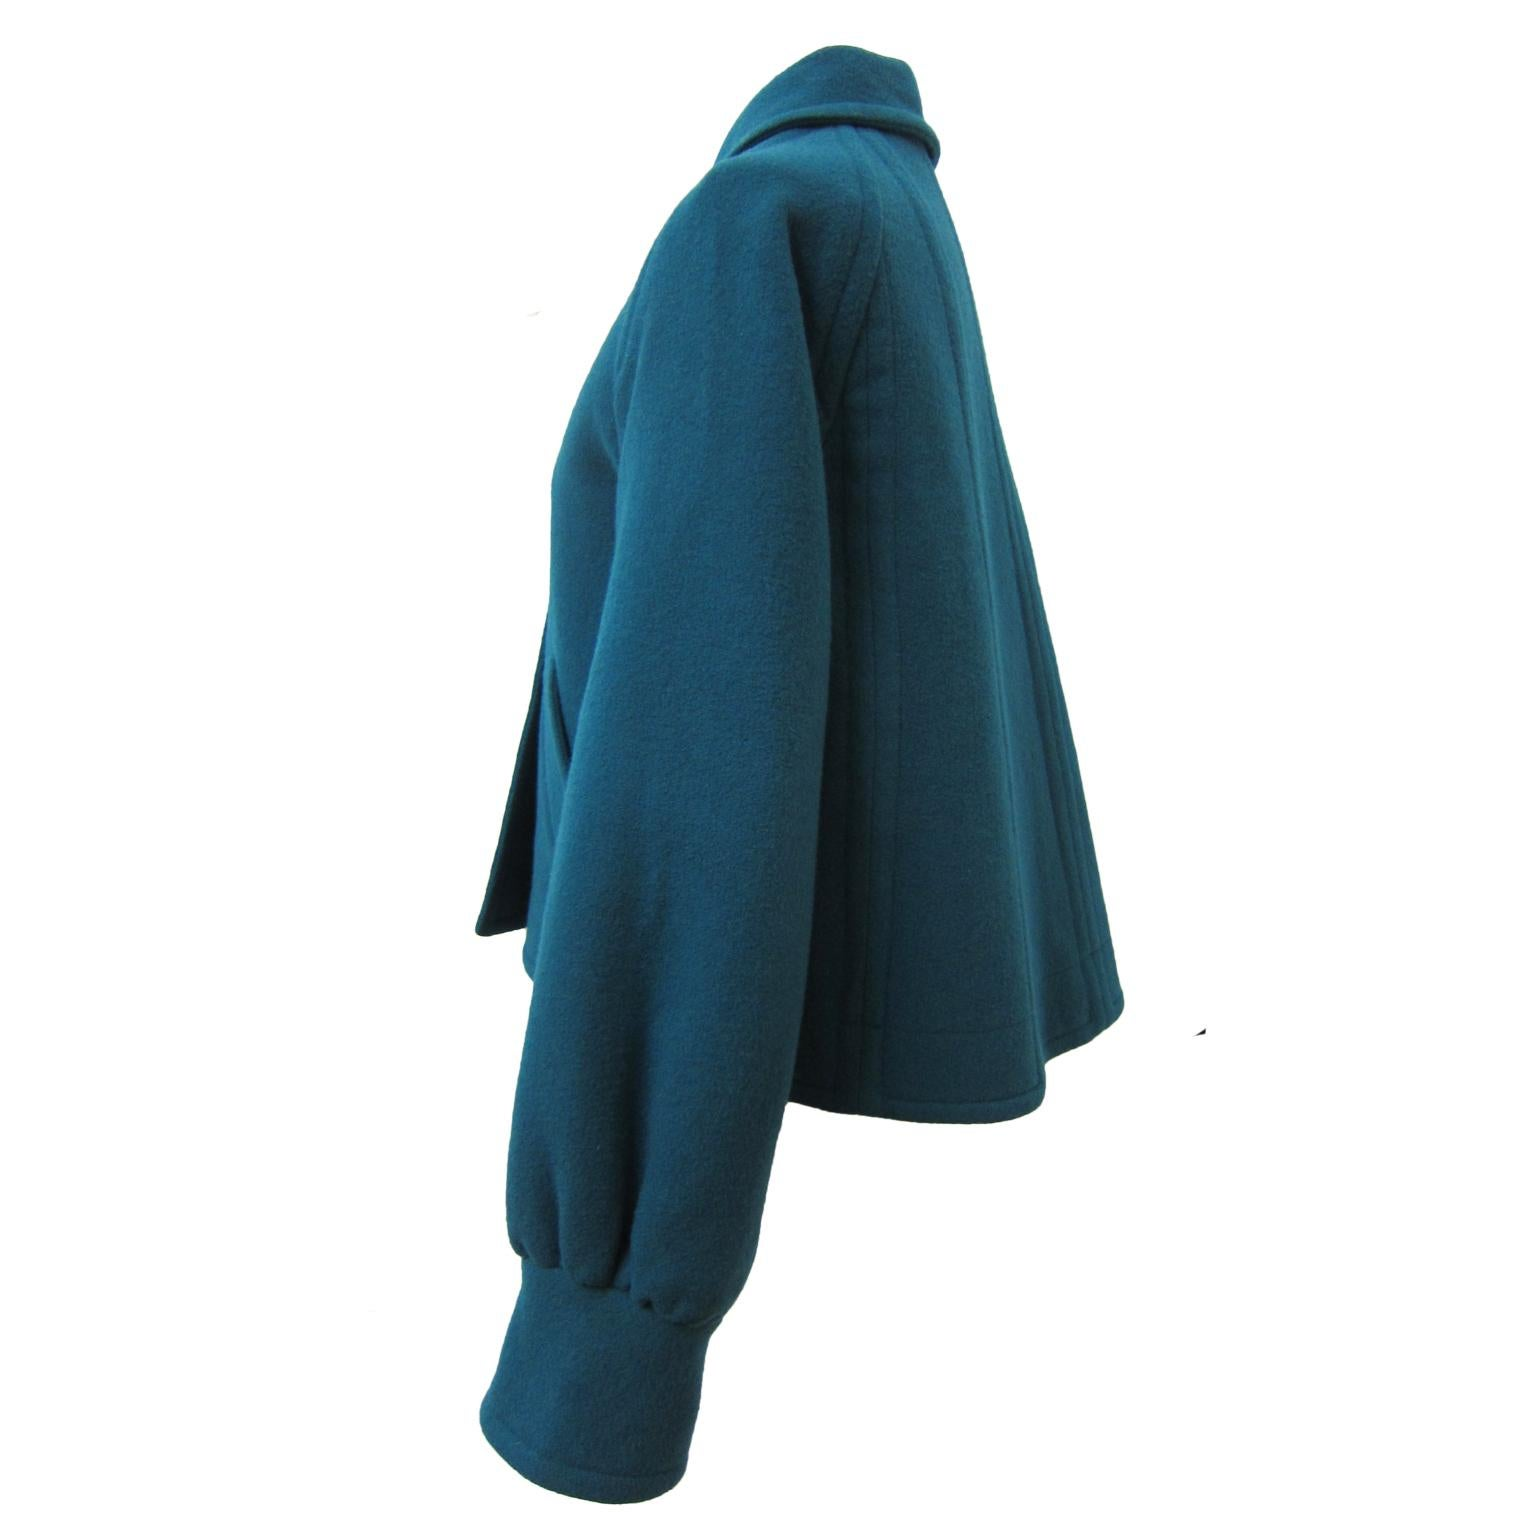 Chloe by Karl Lagerfeld Blue Green Jacket circa 1980s